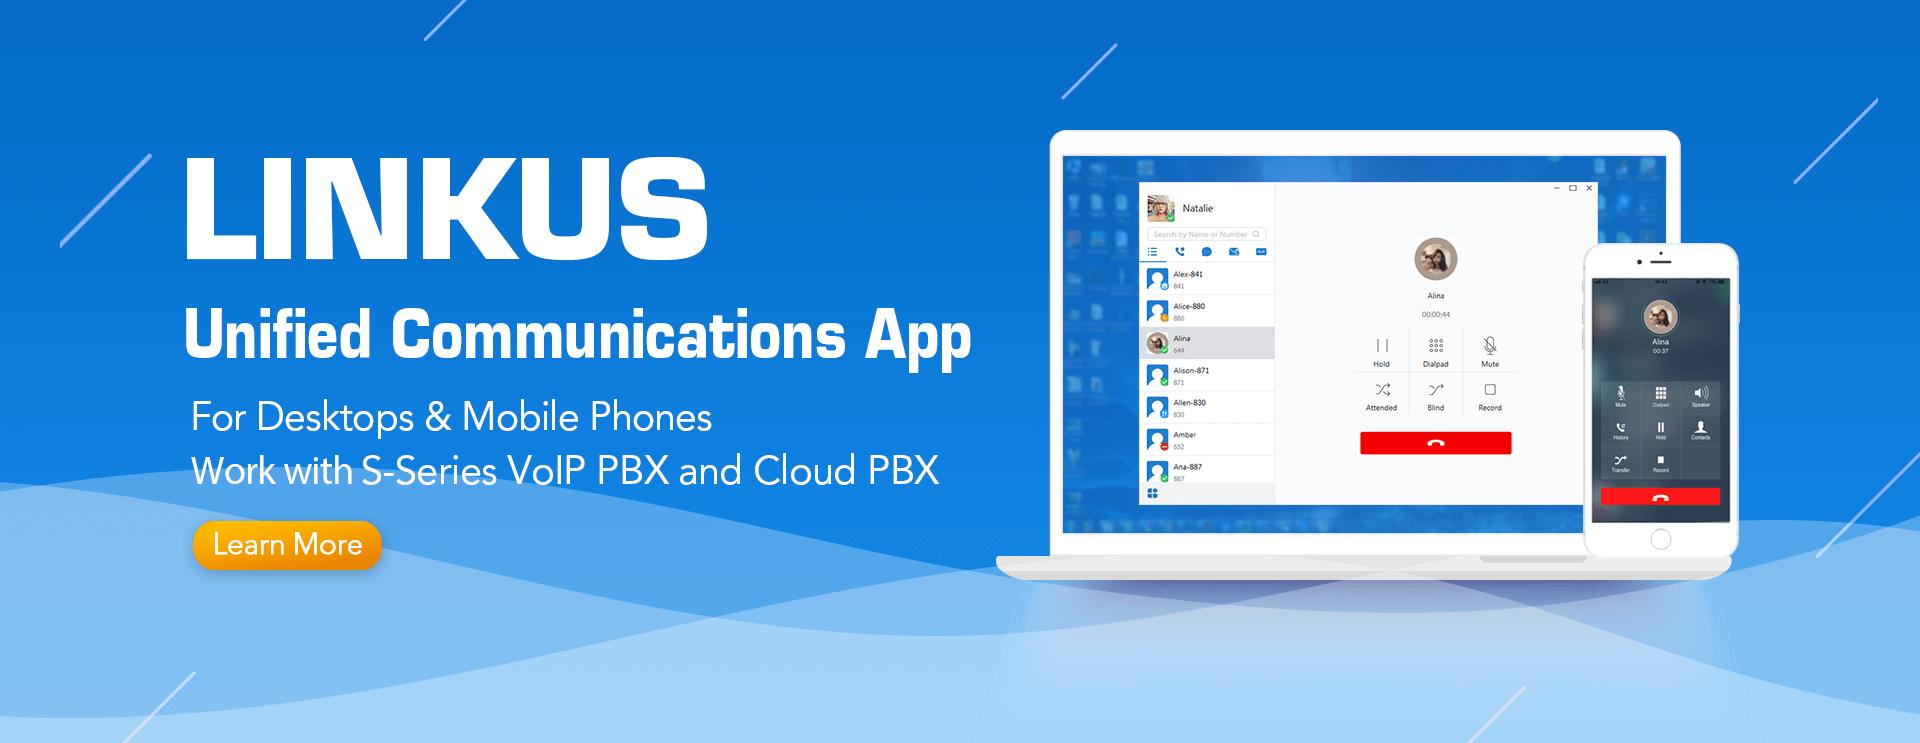 Linkus Unified Communications App